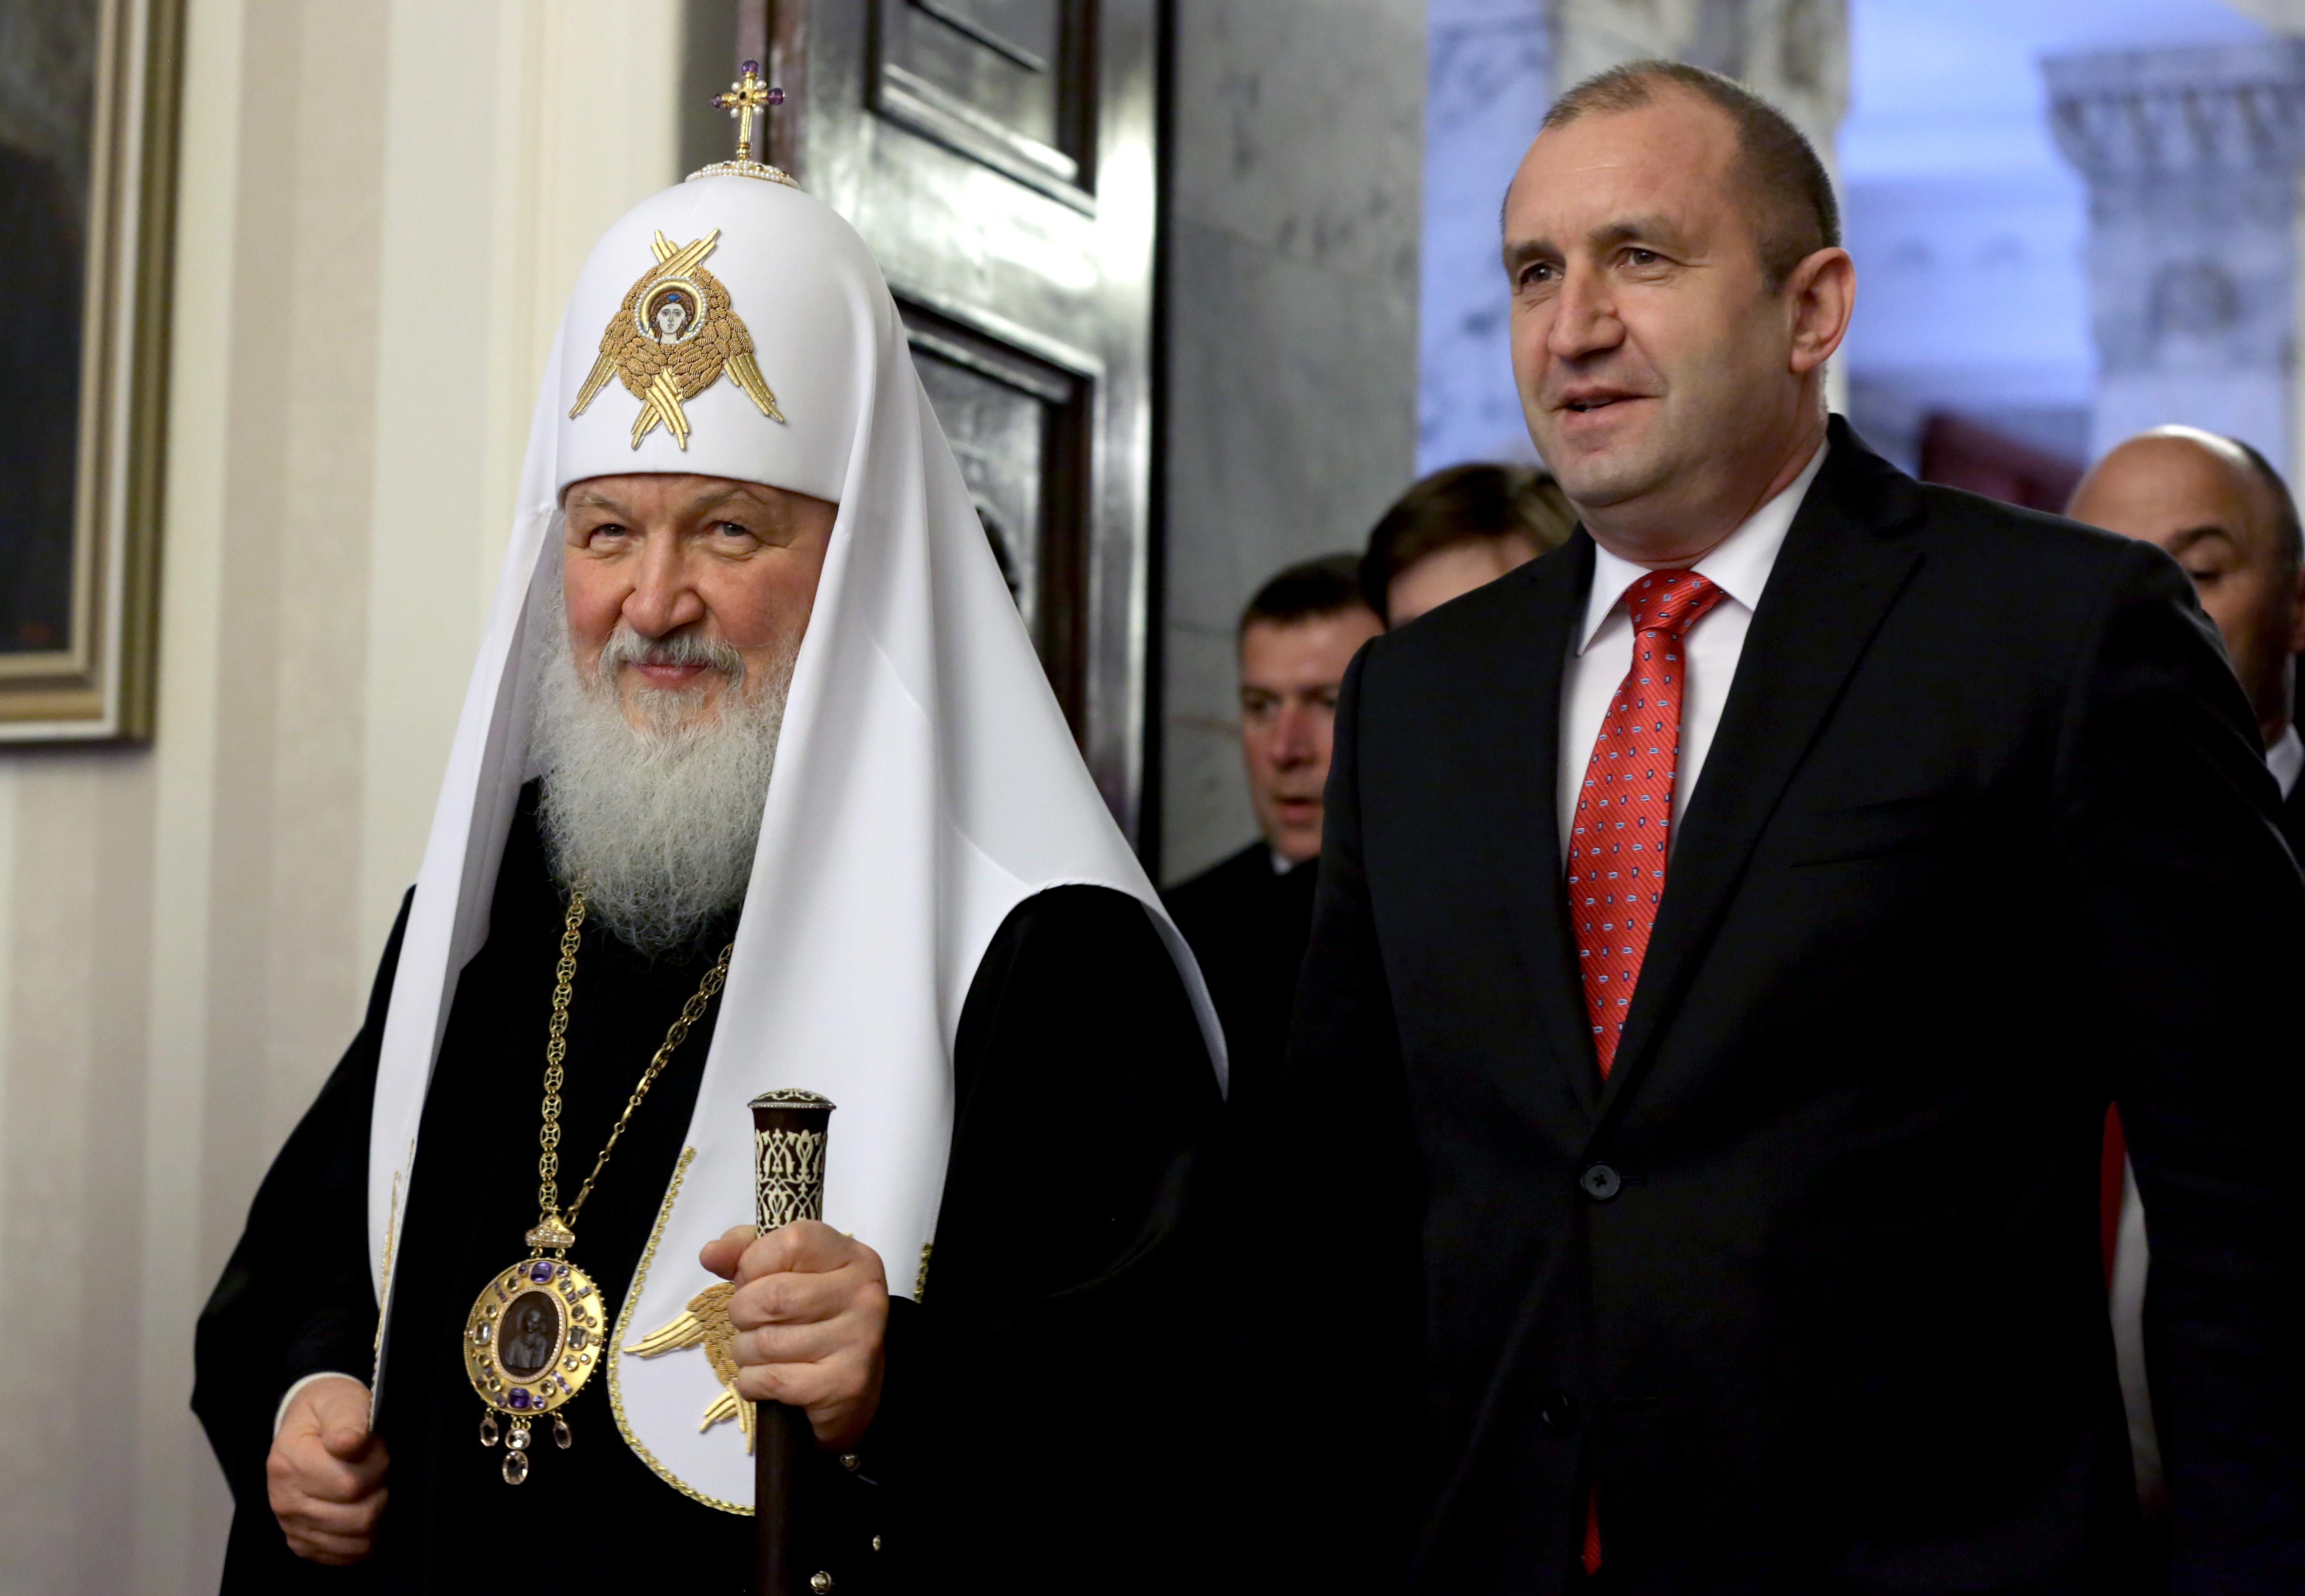 Радев критикува Русия, Решетников - България